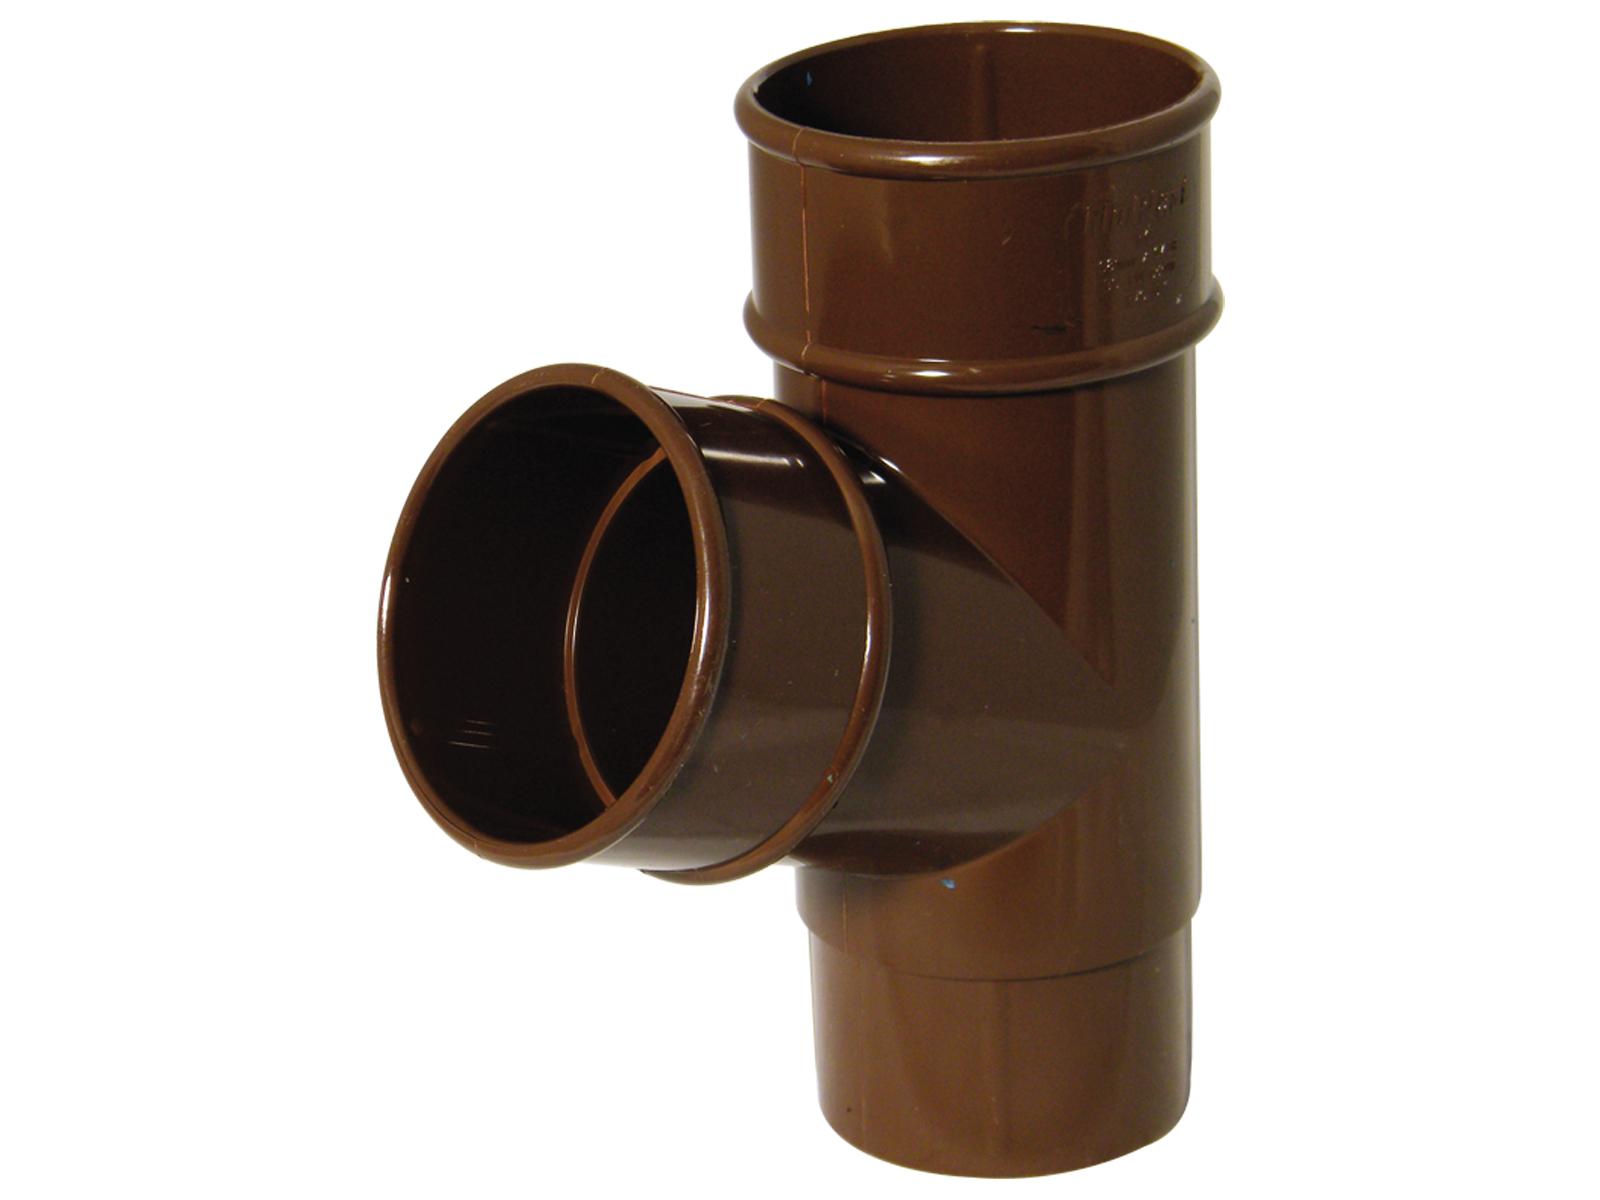 Floplast RY1BR 68mm Round Downpipe - 67.5* Branch - Brown